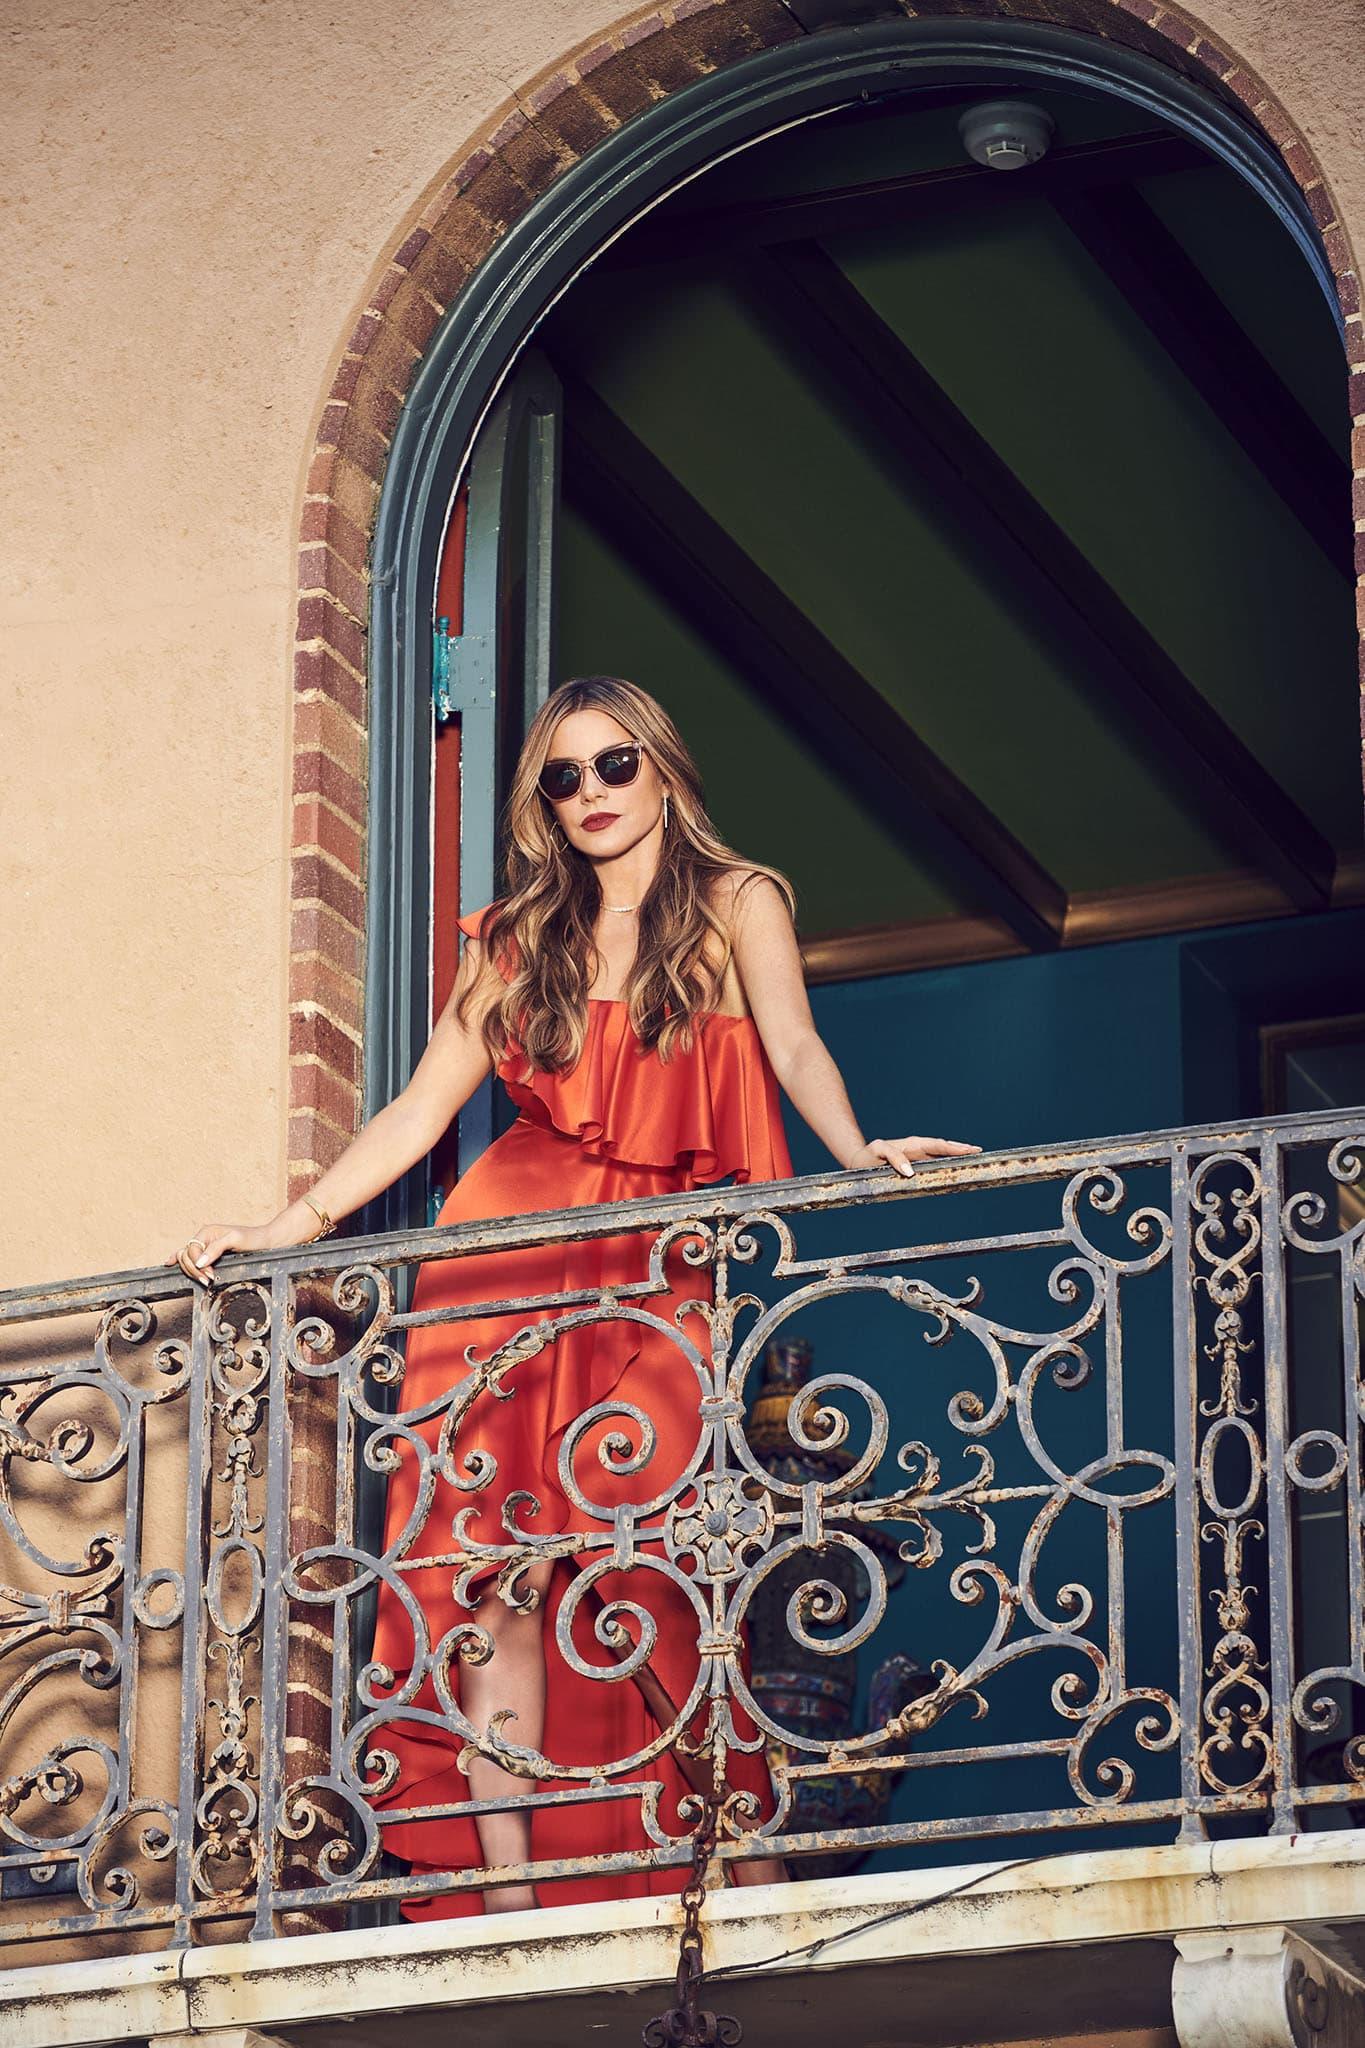 Sofia Vergara wearing her Foster Grant sunglass design